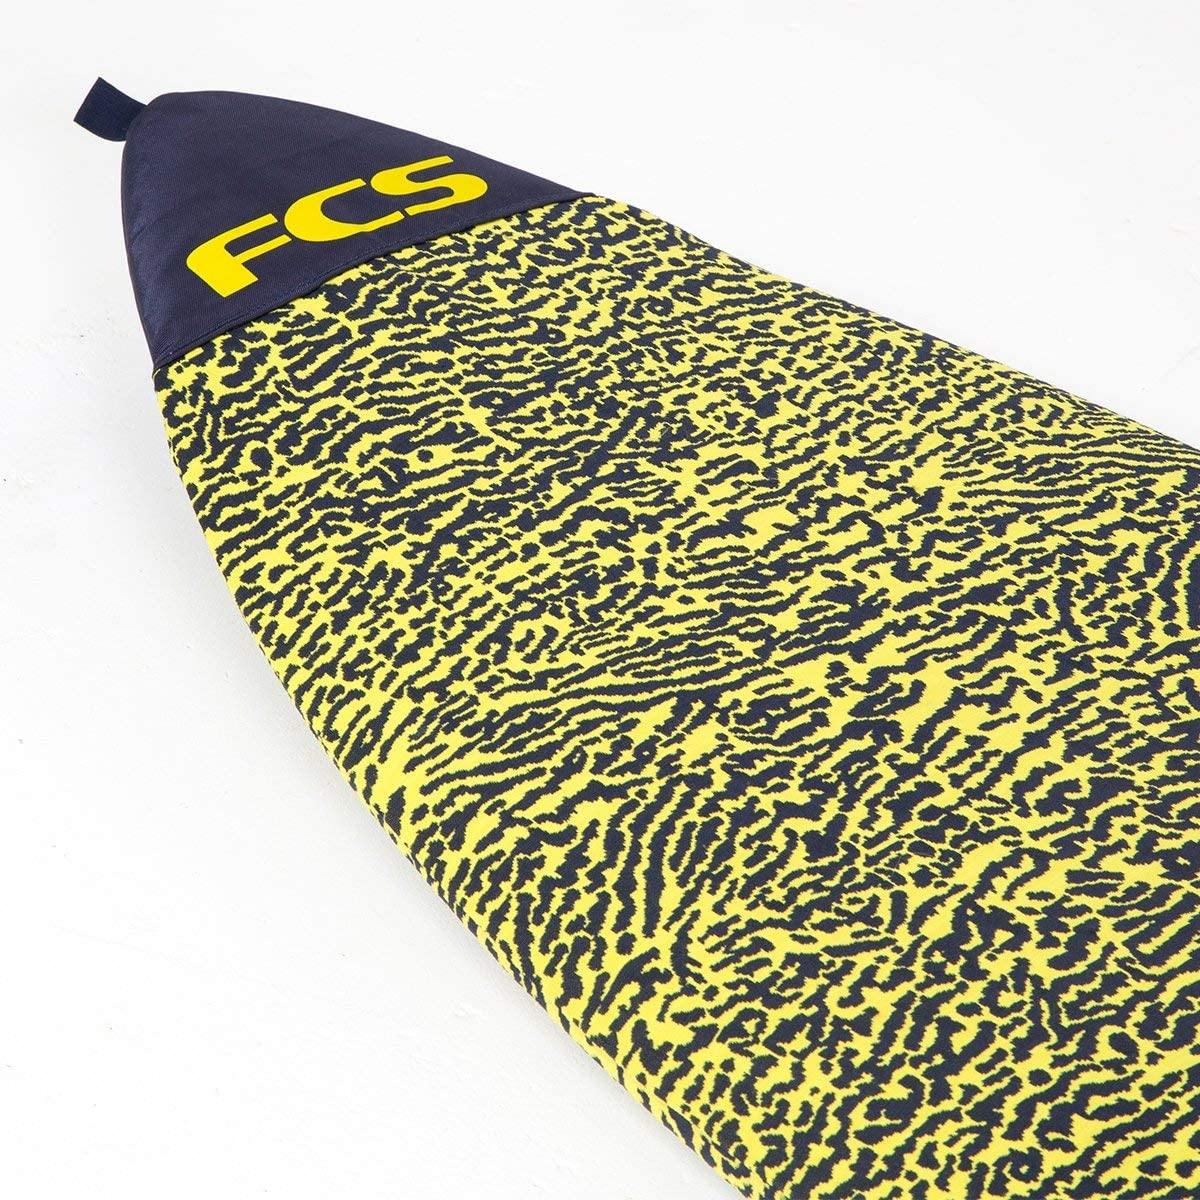 FCS Stretch All Purpose Board Cover